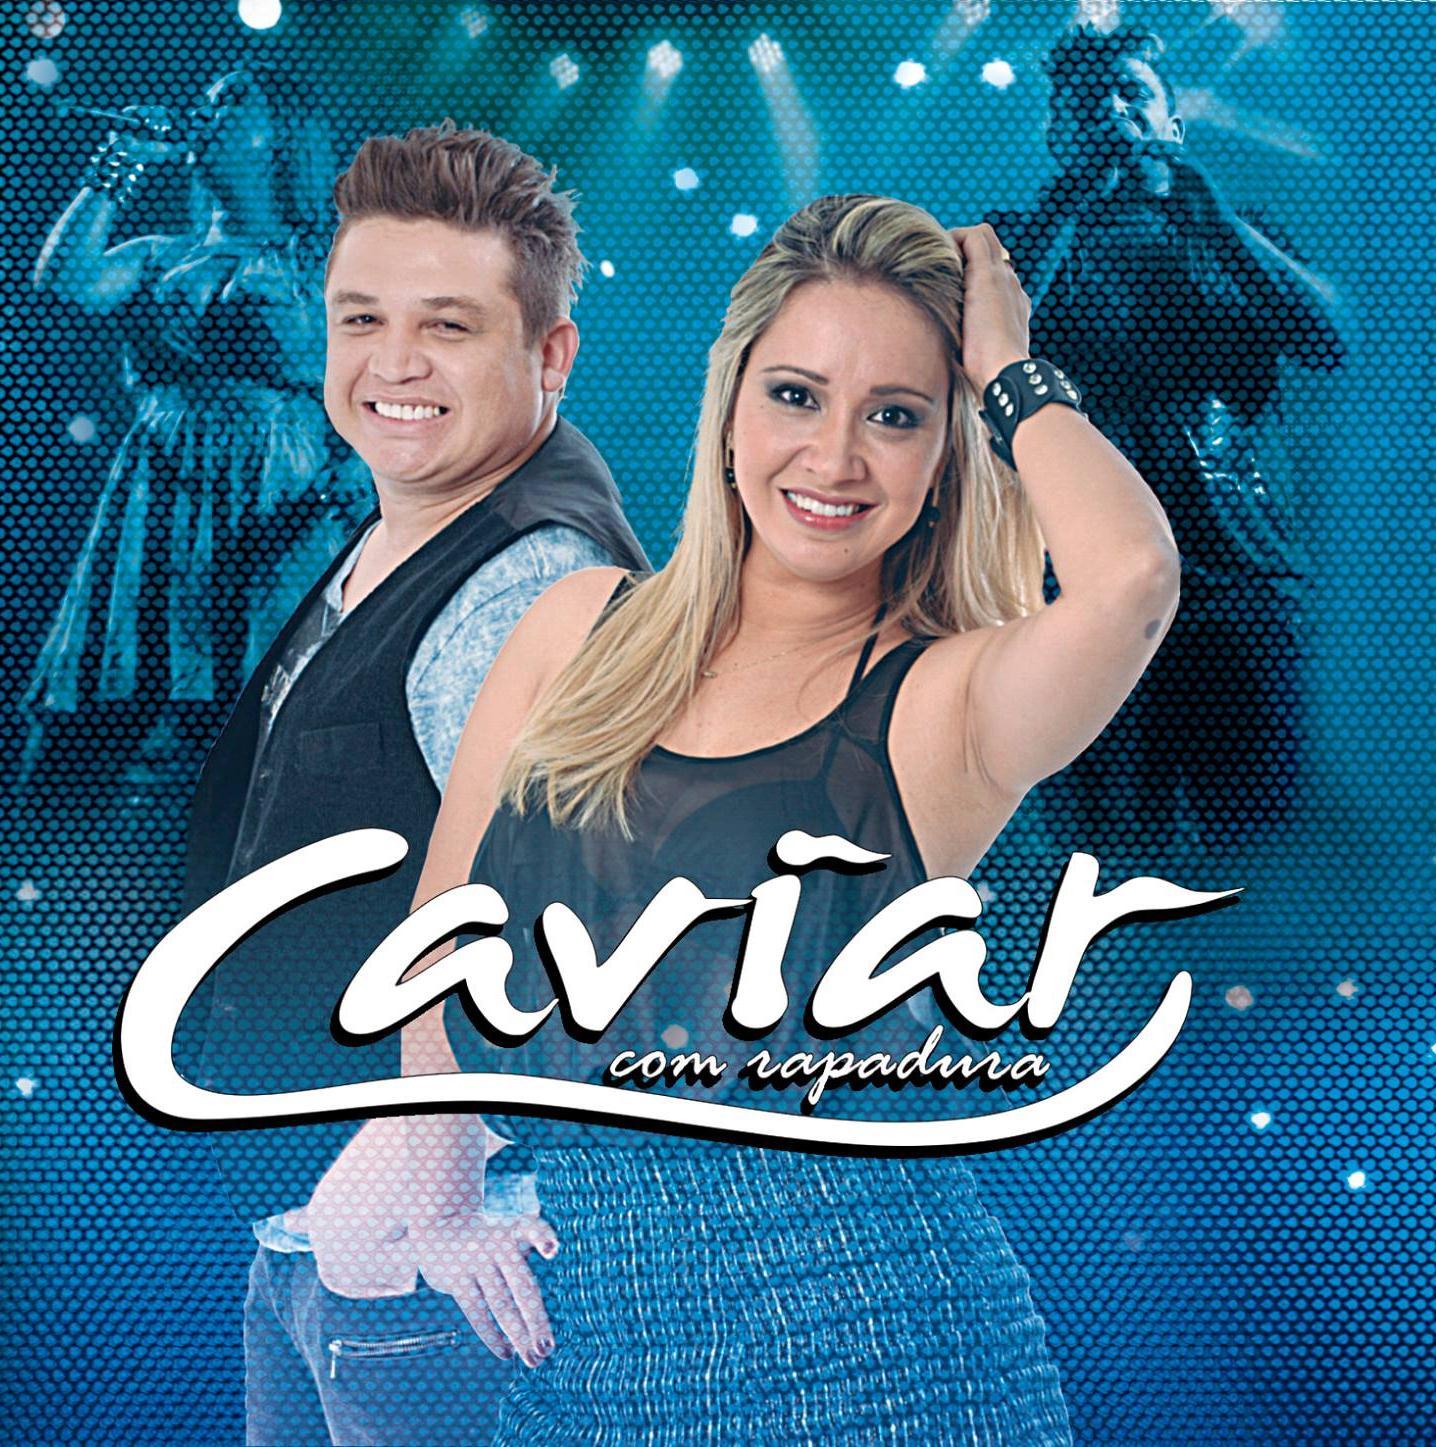 cd caviar com rapadura 2013